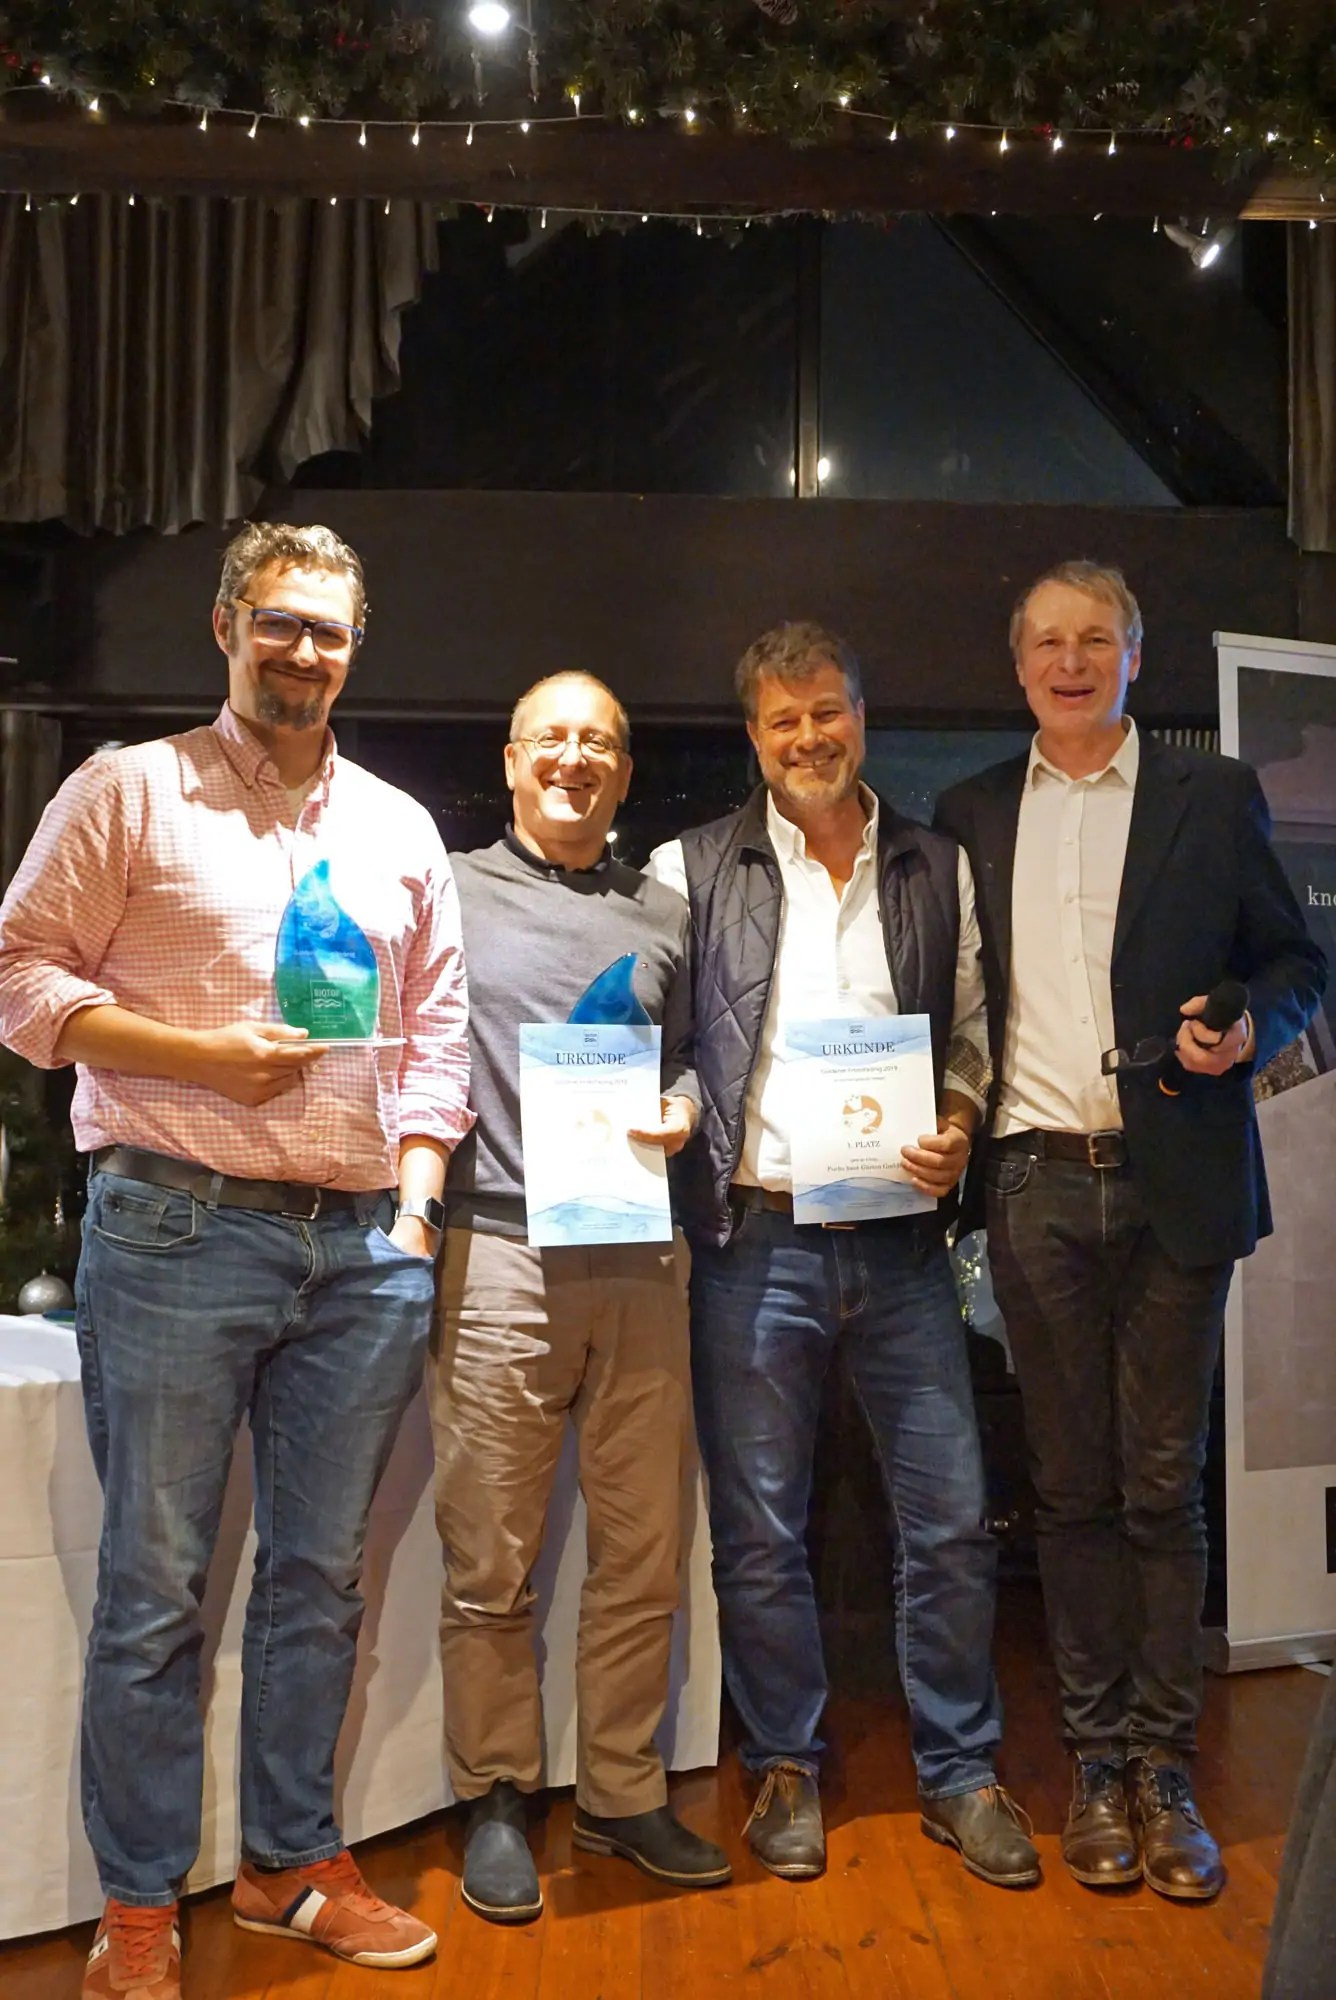 FREIRAUM Preisverleihung Froschkoenig 2019